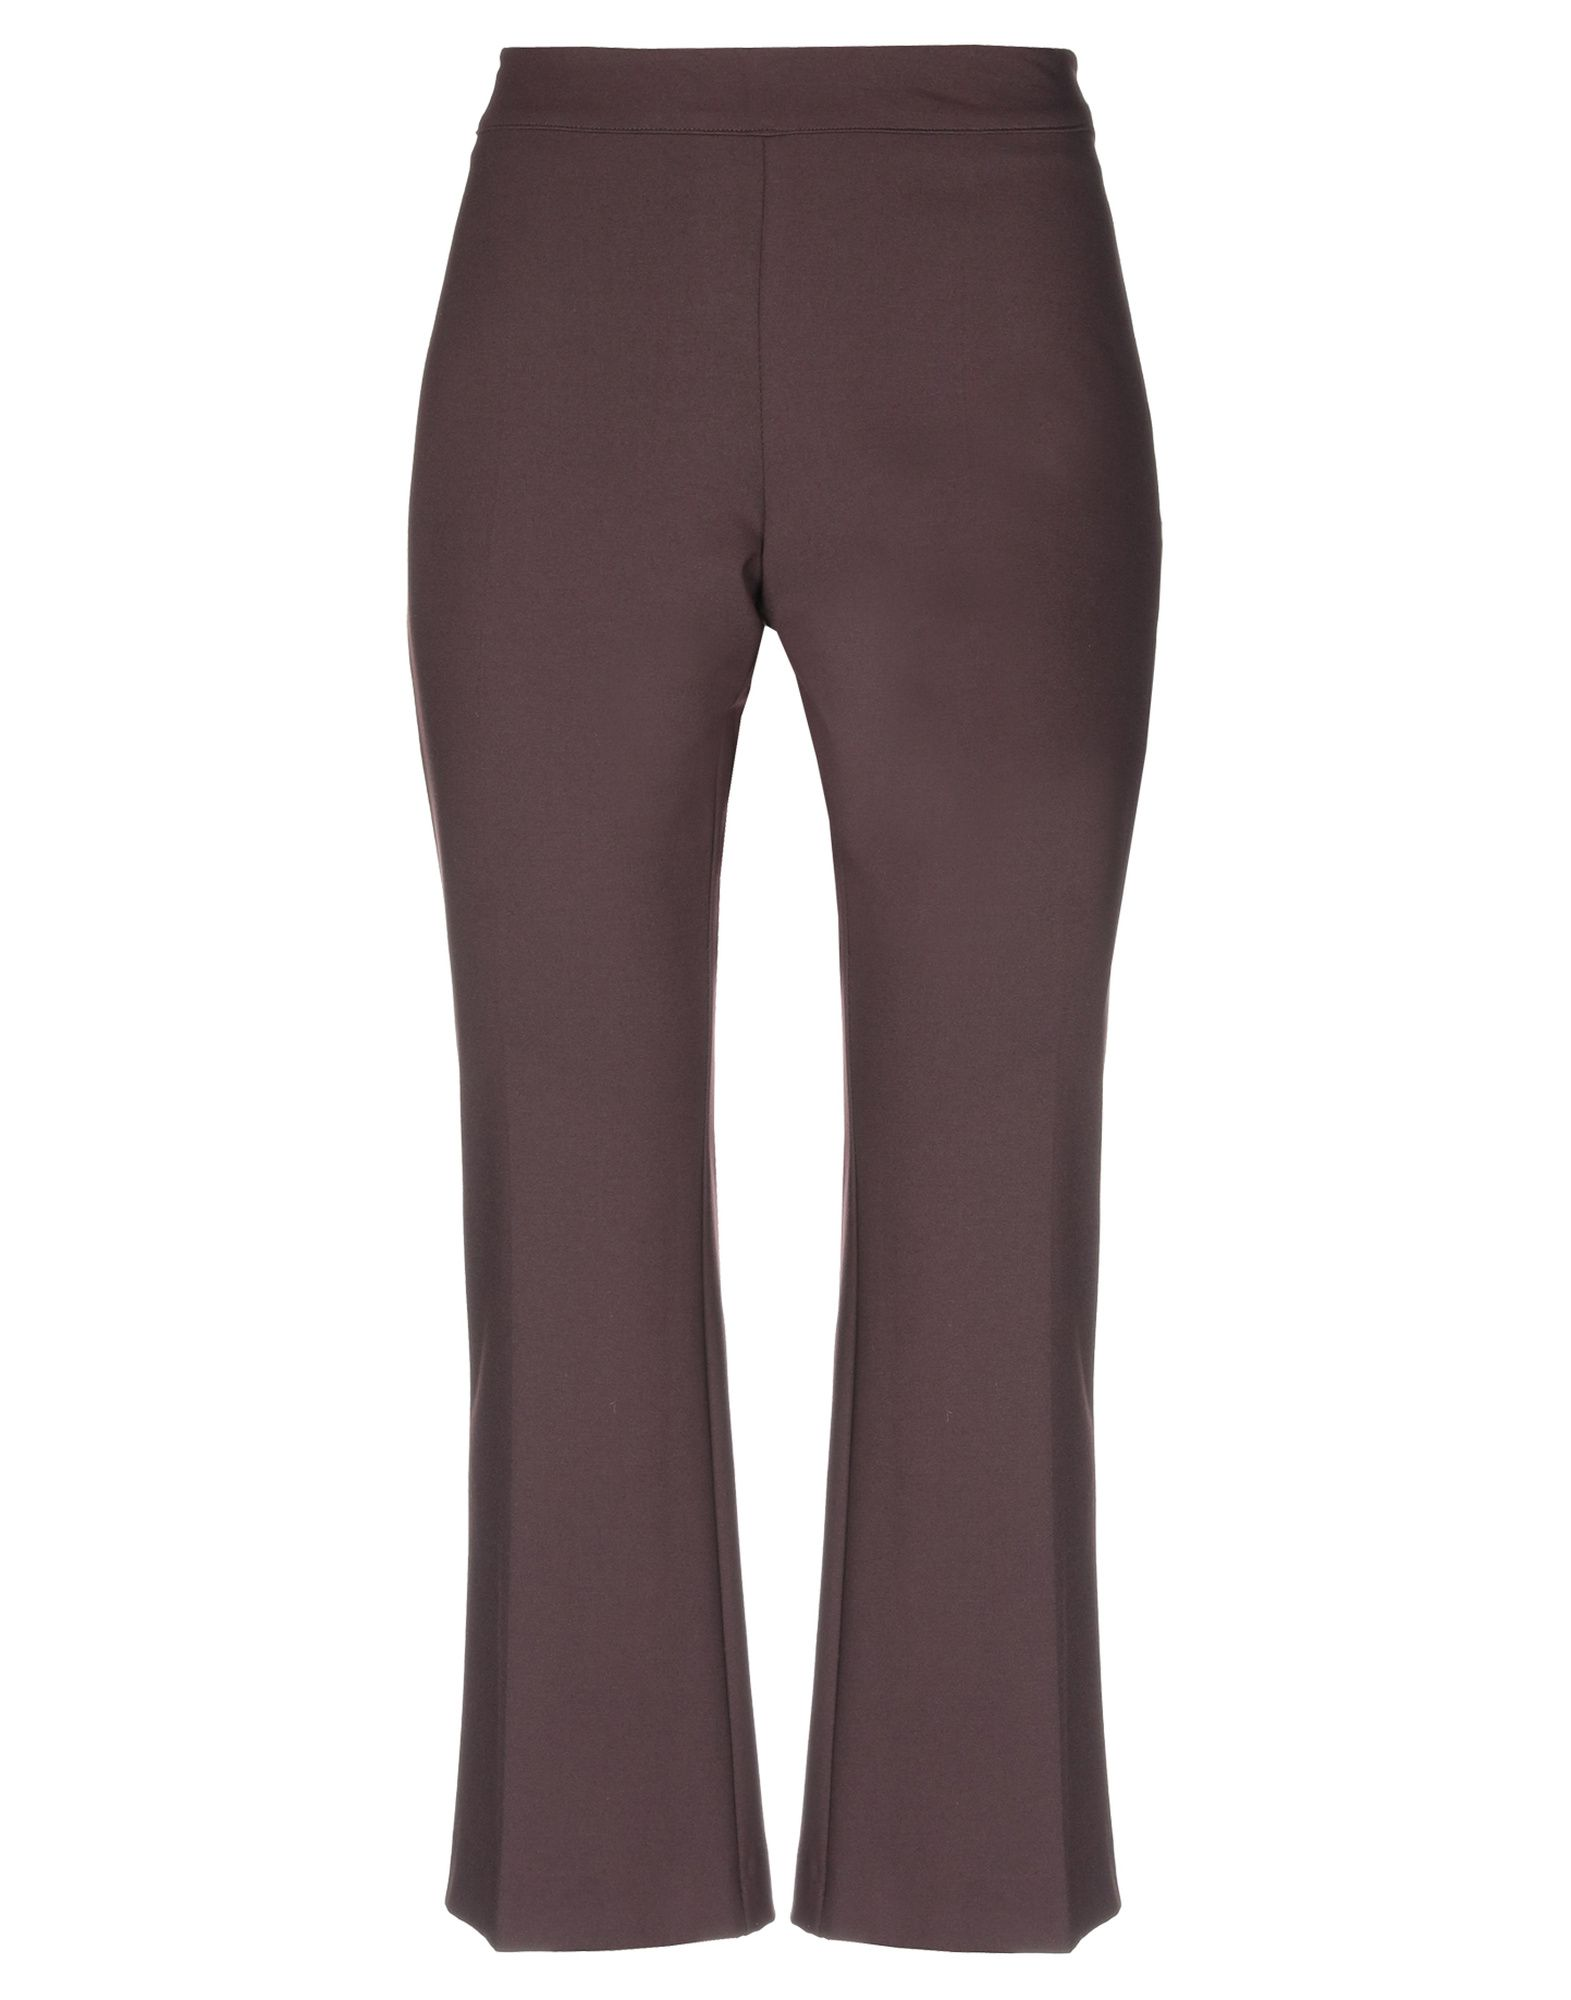 Pantalone Lanacaprina damen - 13335998RL